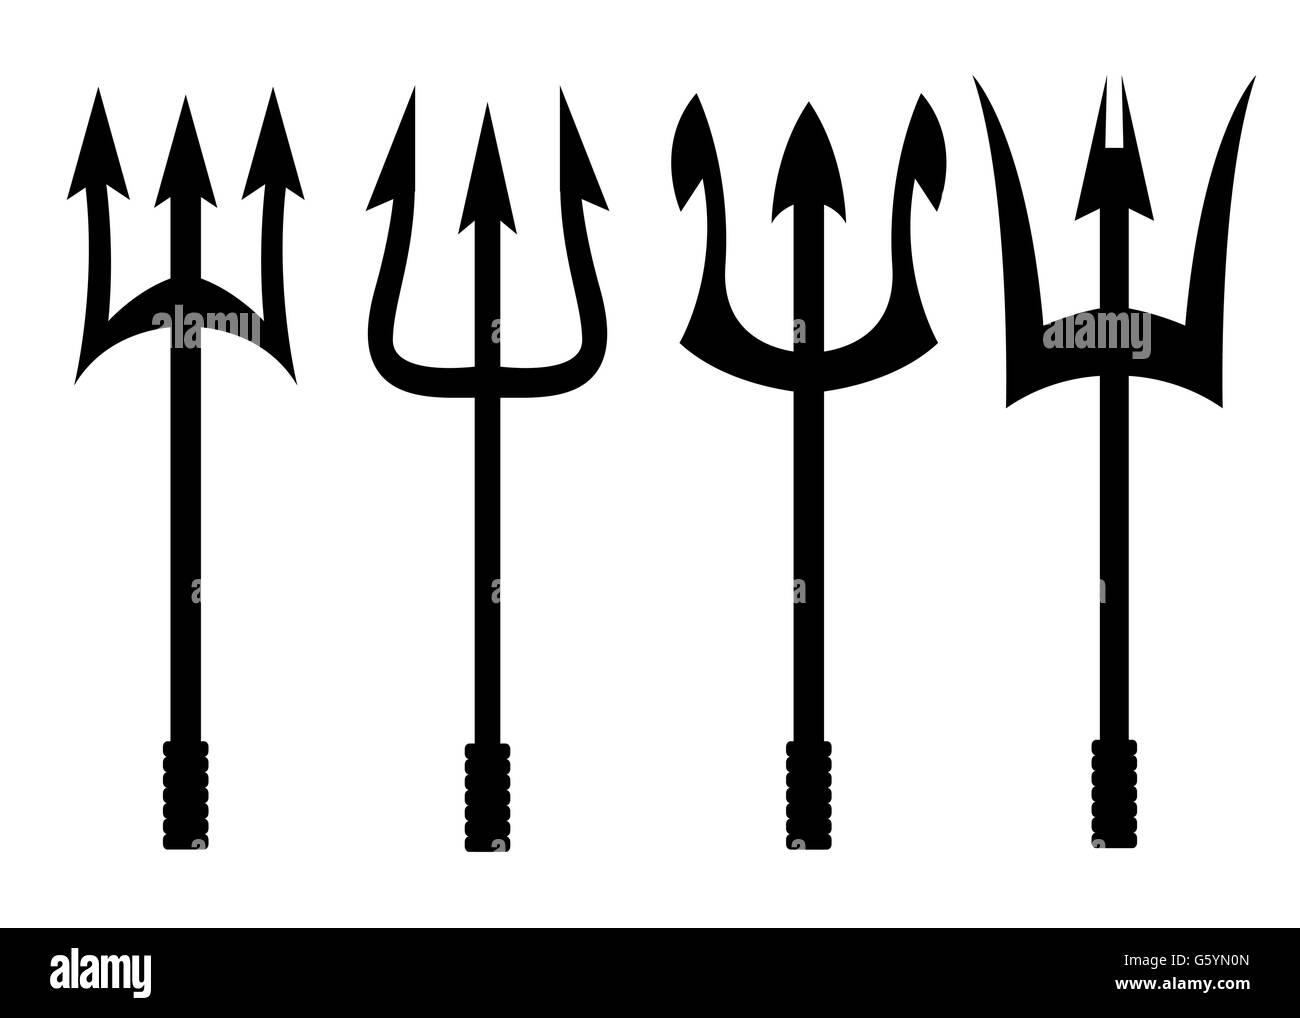 Vector black trident icons set - Stock Image